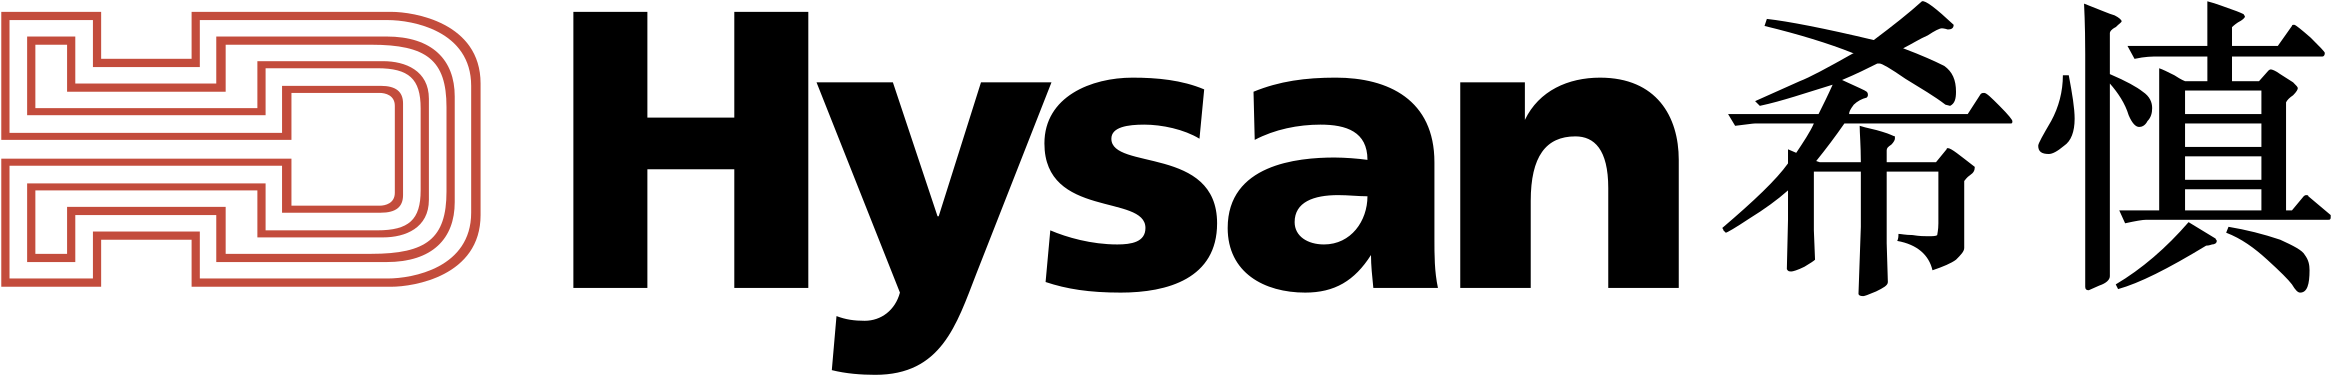 23-236462_hysan-development-logo-png-transparent-hysan-development-company.png